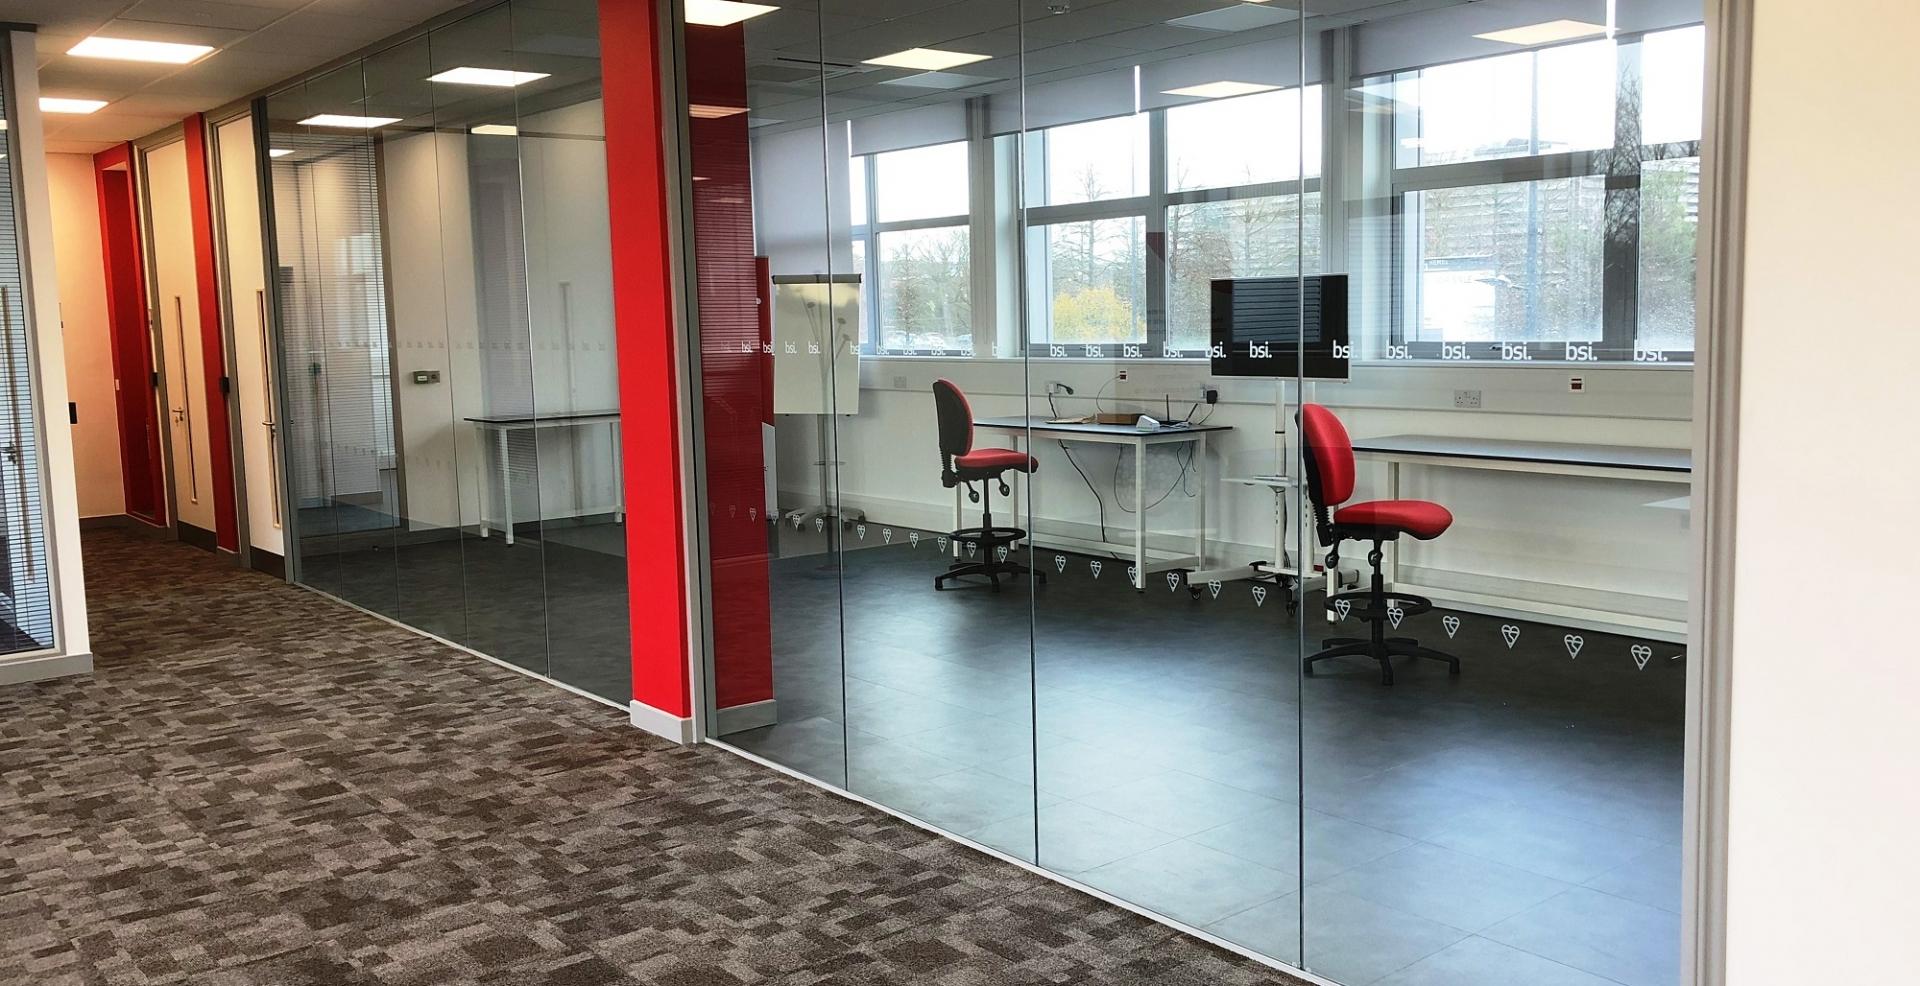 Office Refurbishment Bsi Group Hemel Hempstead